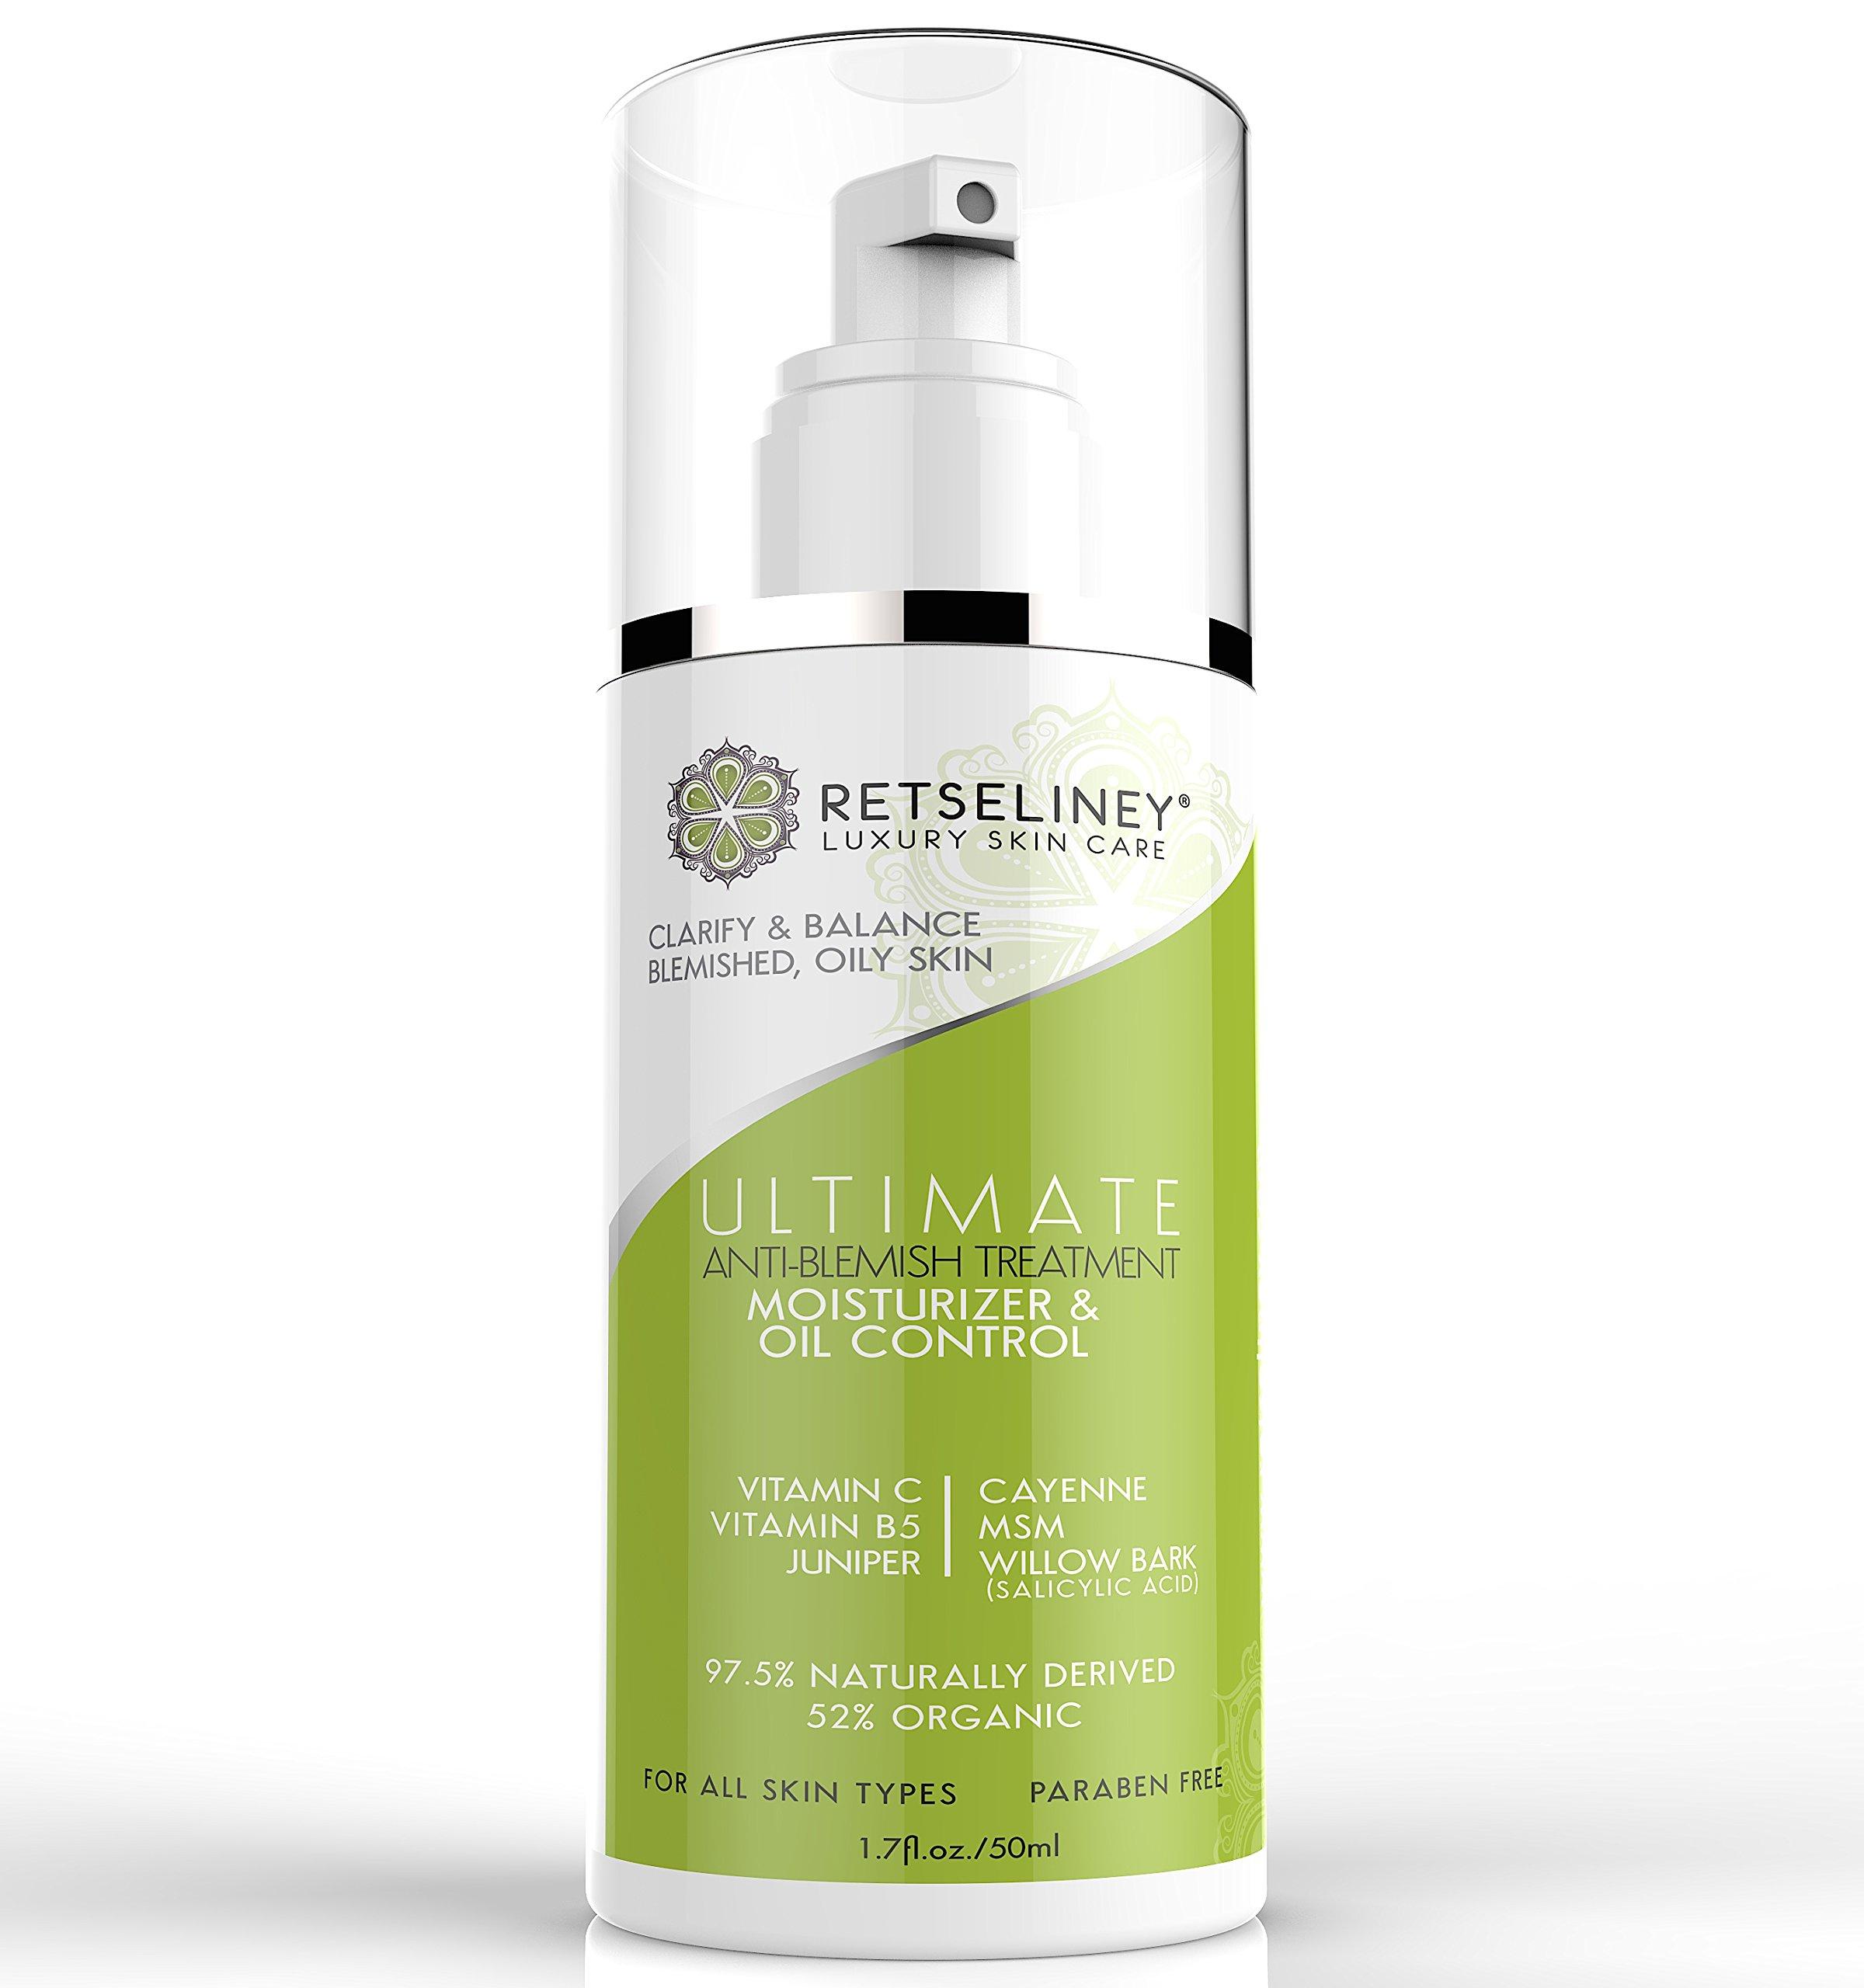 Retseliney Acne-Treatment Oil-Control Moisturizer Cream with 2% Salicylic Acid and Vitamin C